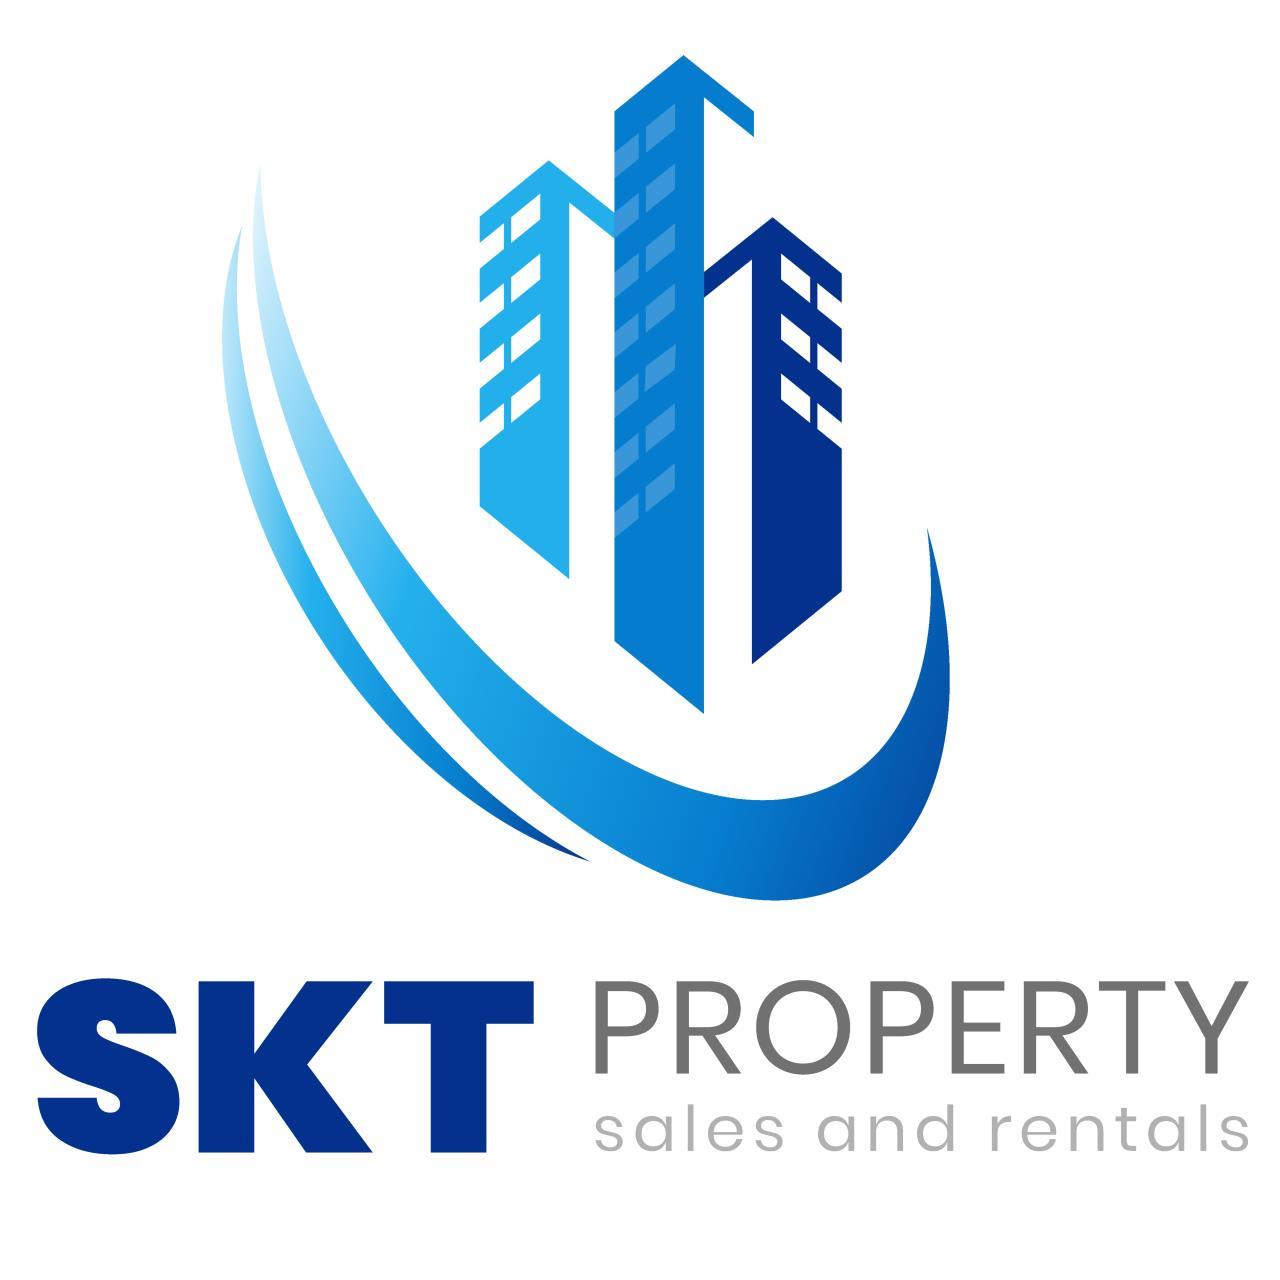 Sukritta Property logo